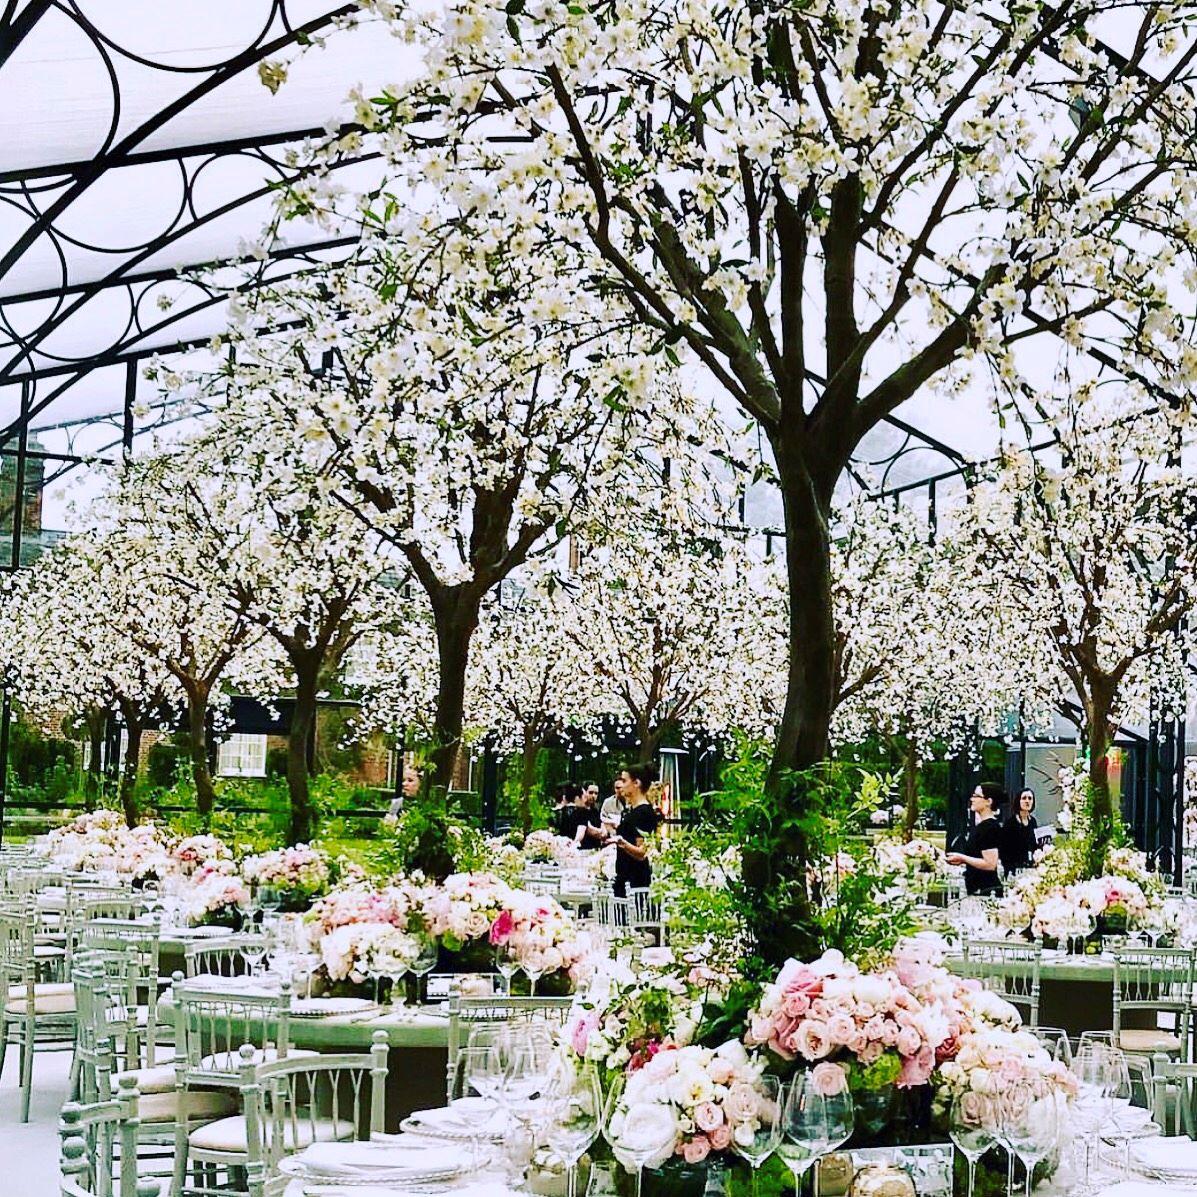 Inside Pippa Middleton's Floral Wedding Reception | ELLE - photo#1